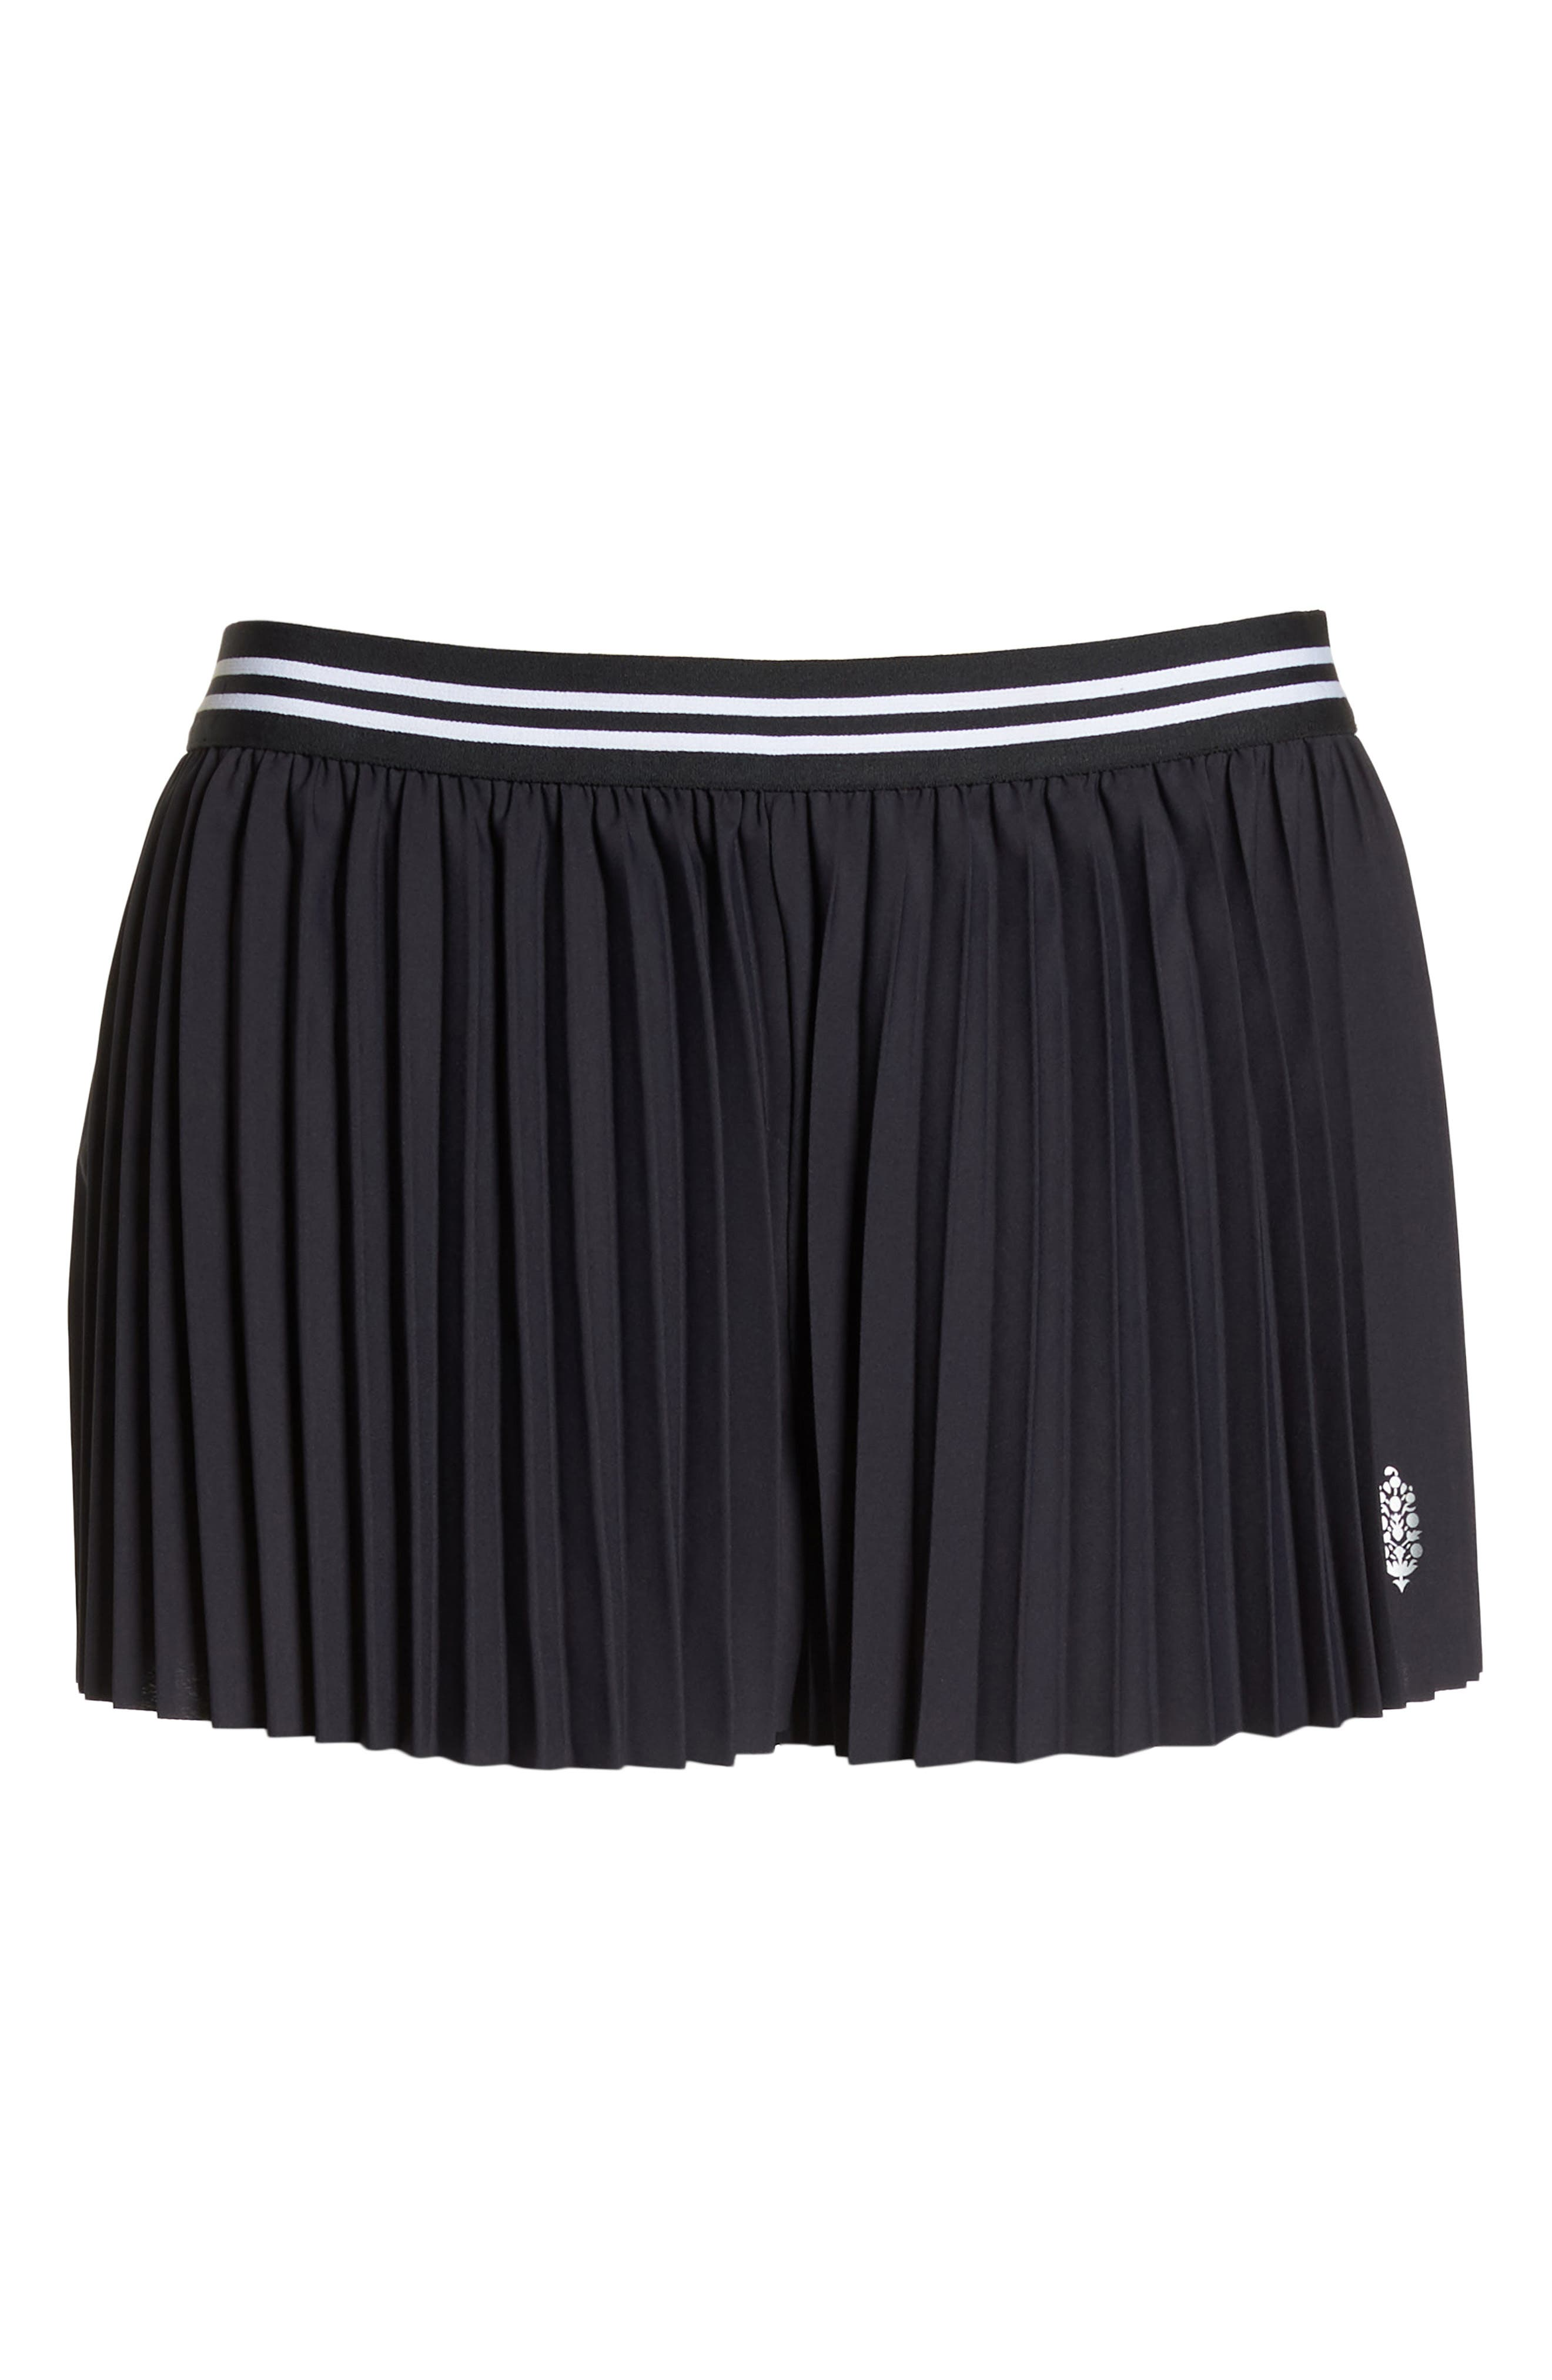 Zephyr Shorts,                             Alternate thumbnail 7, color,                             001